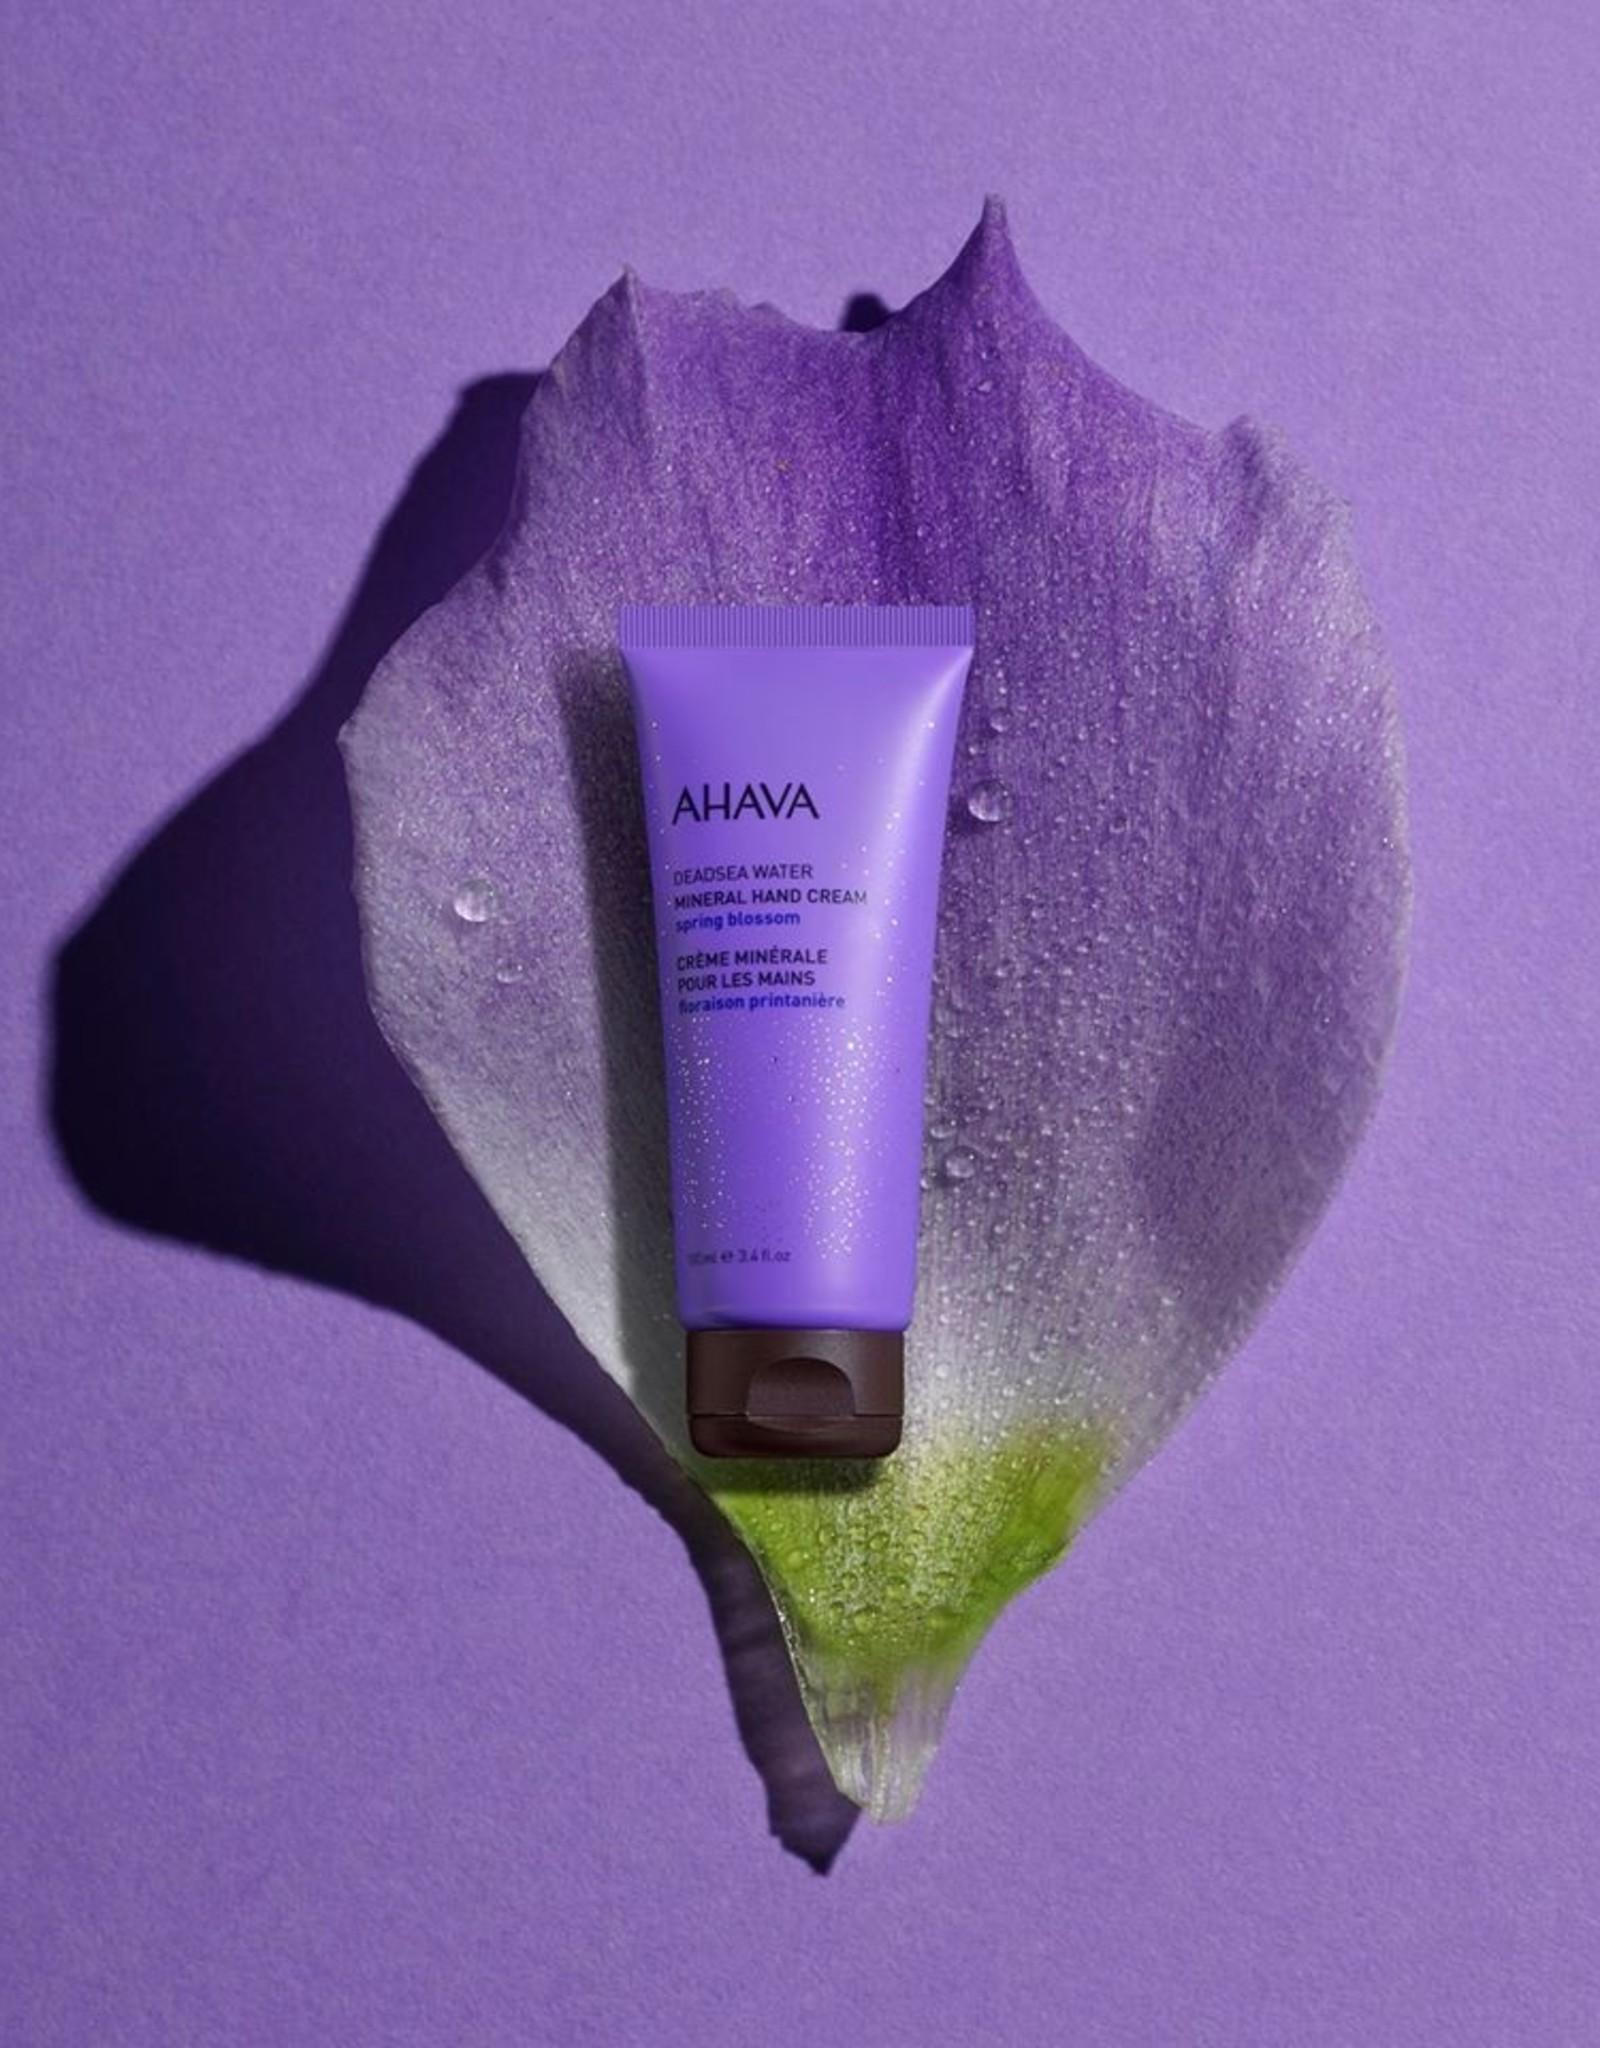 AHAVA Spring blossom hand cream 100ml